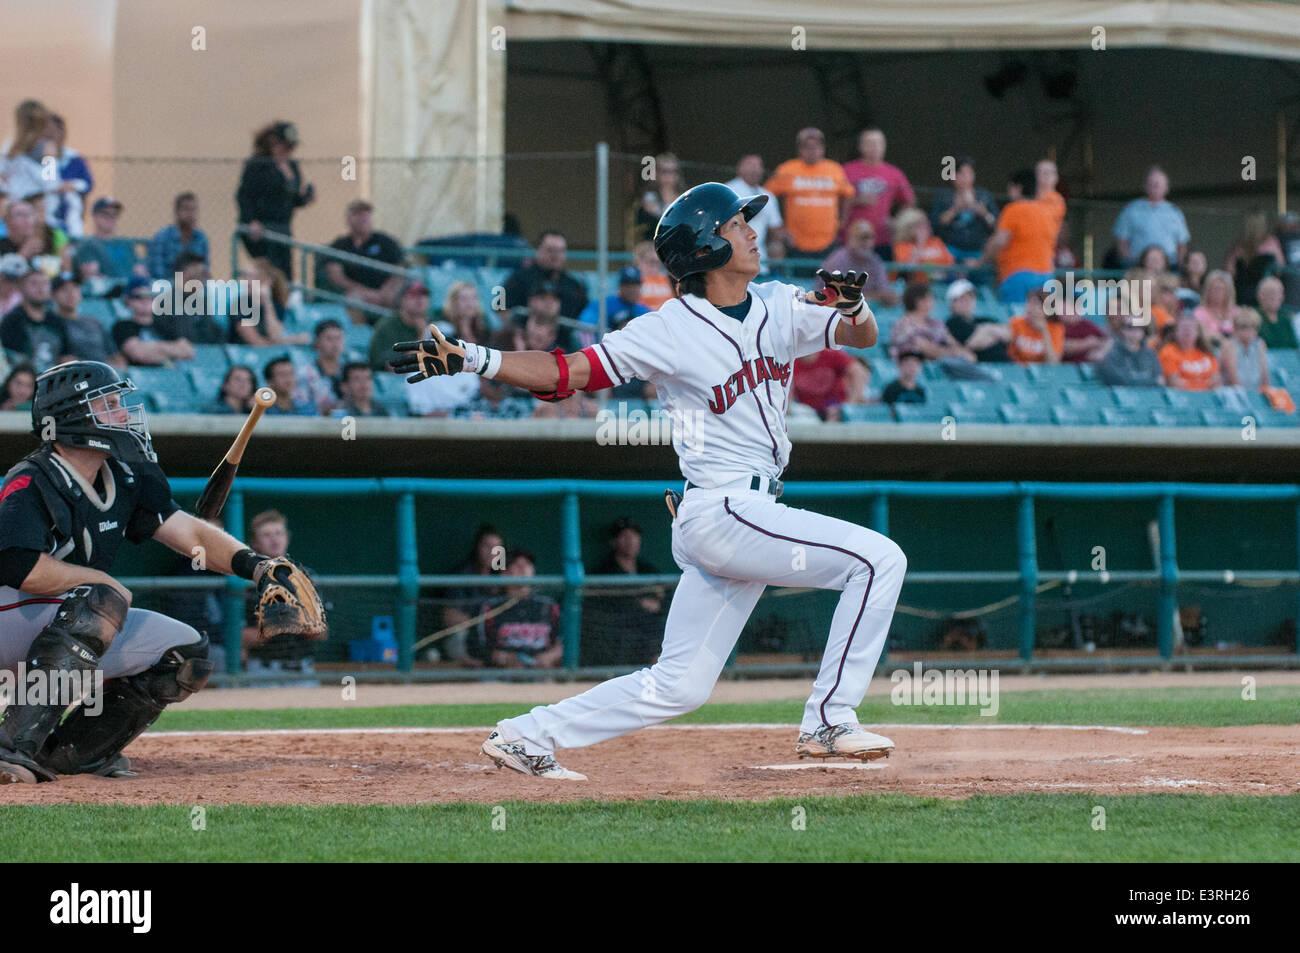 Lancaster, California, USA. 27 June 2014, Lancaster Municipal Stadium, Lancaster, CA, Houston Astros prospect Chan - Stock Image